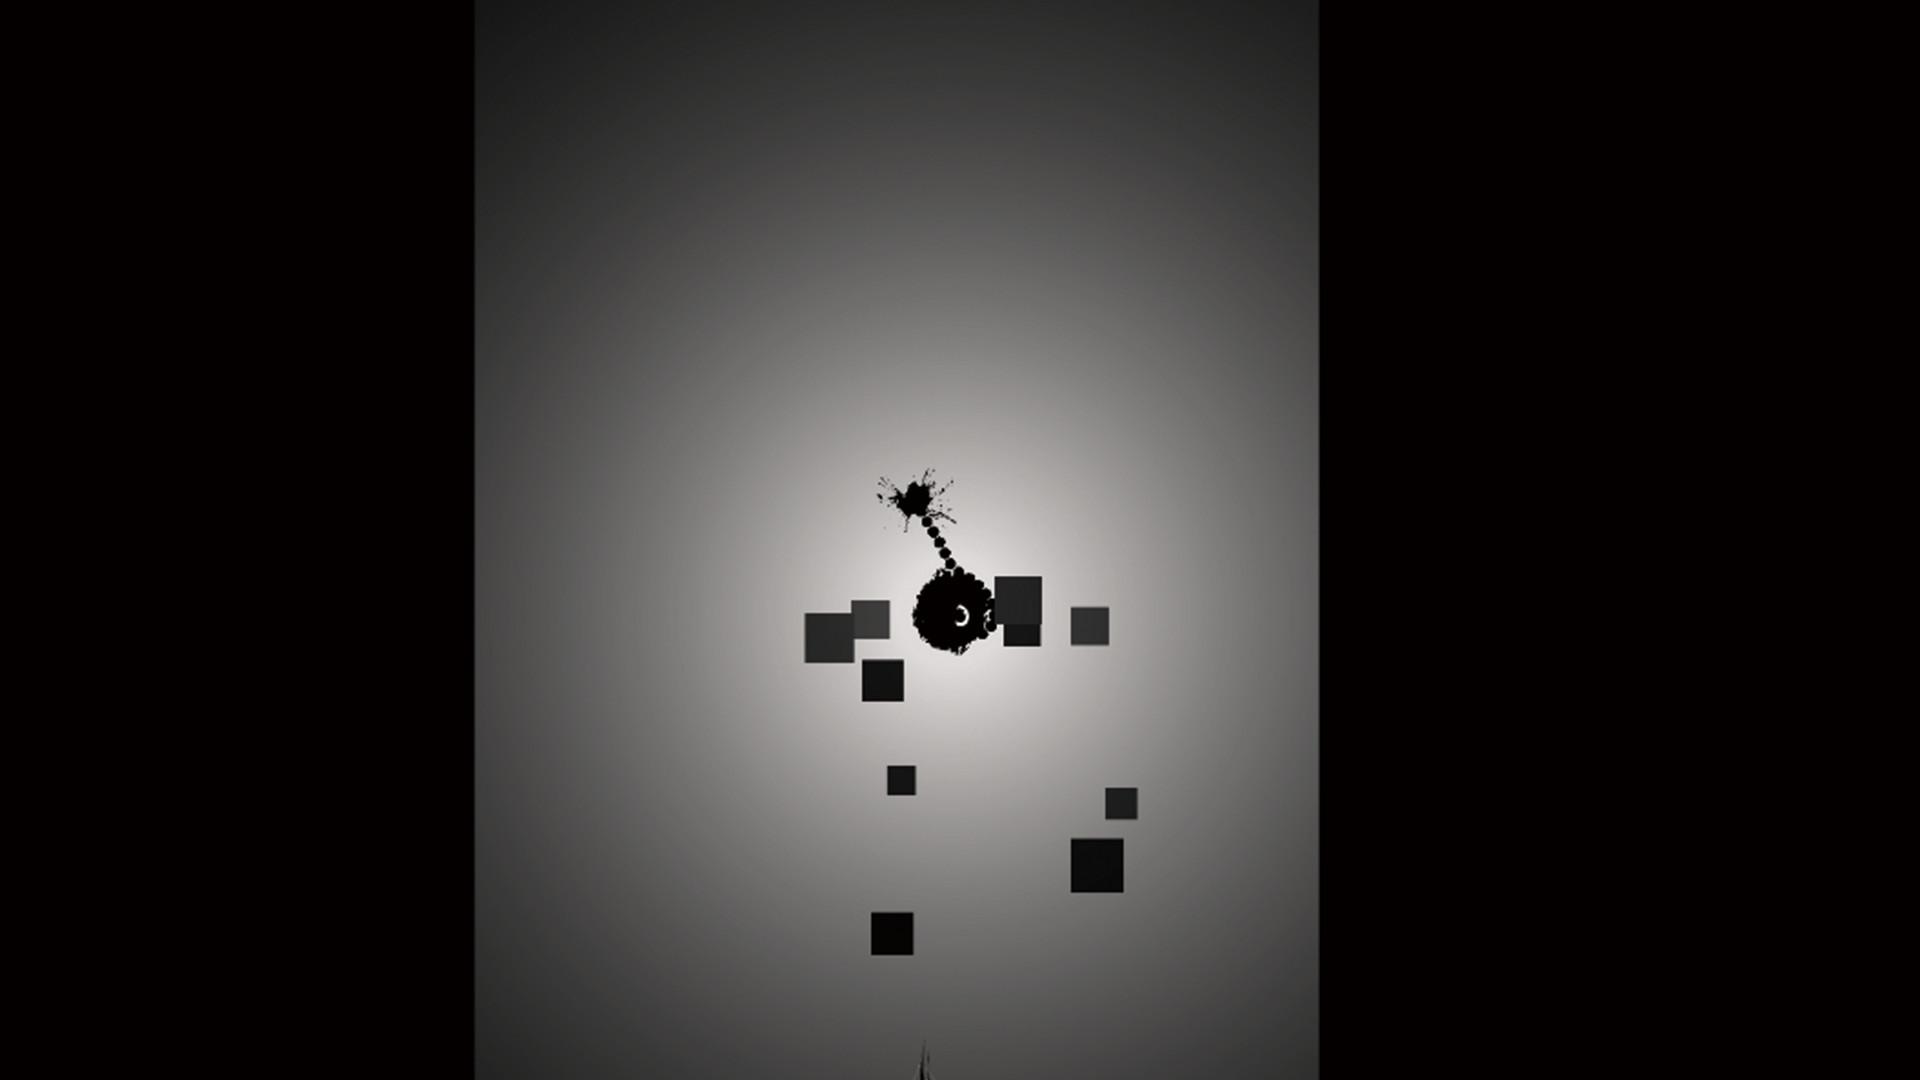 墨游记 Inkball adventures screenshot